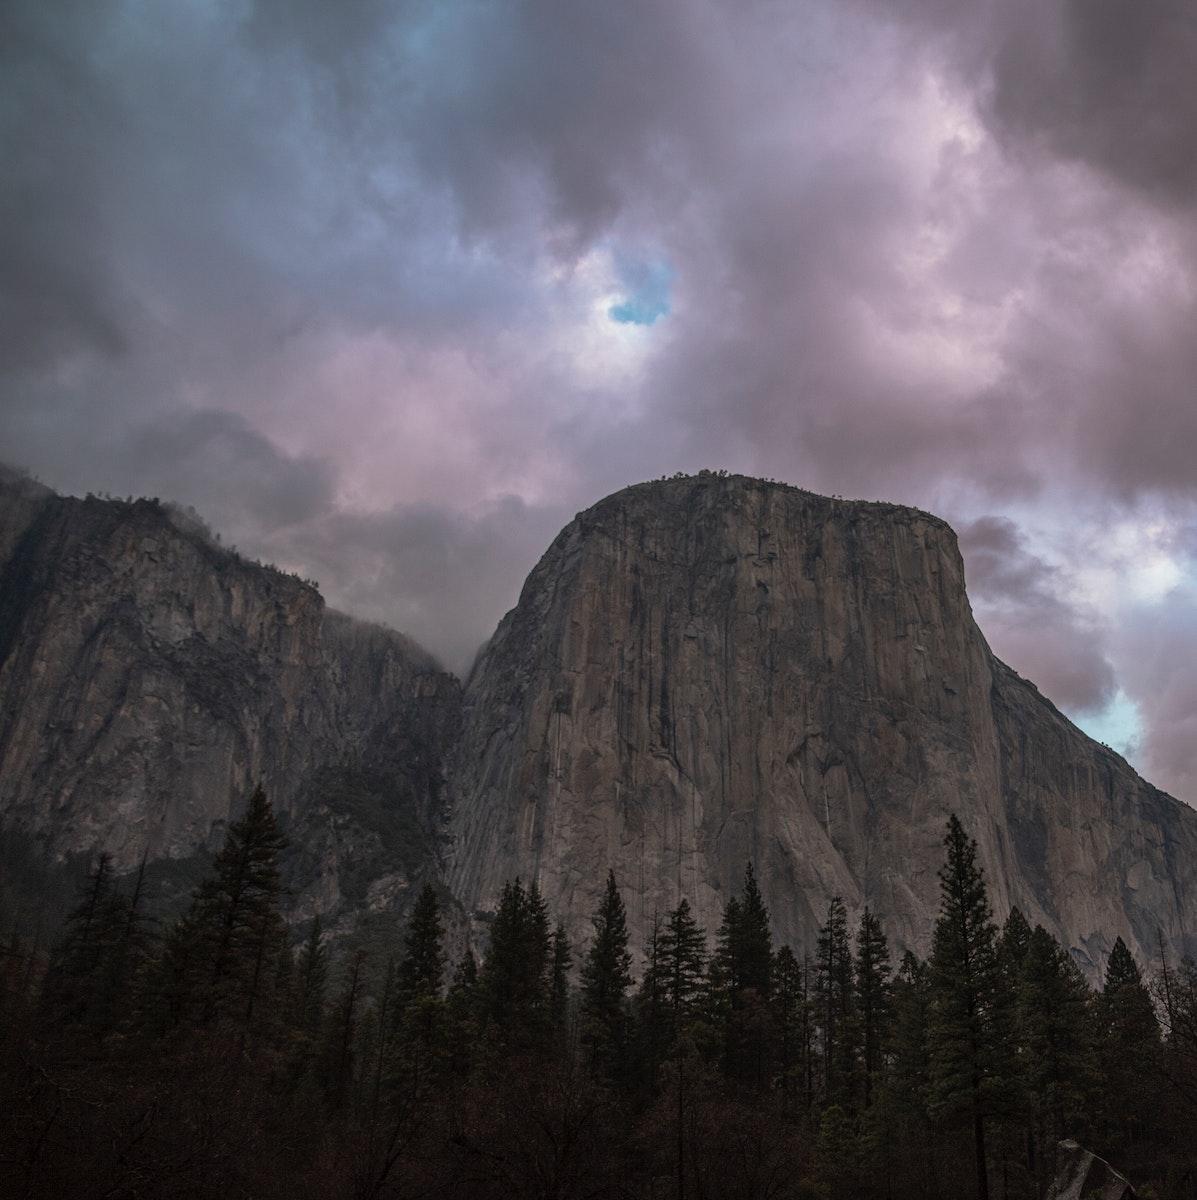 View of Yosemite Valley, United States